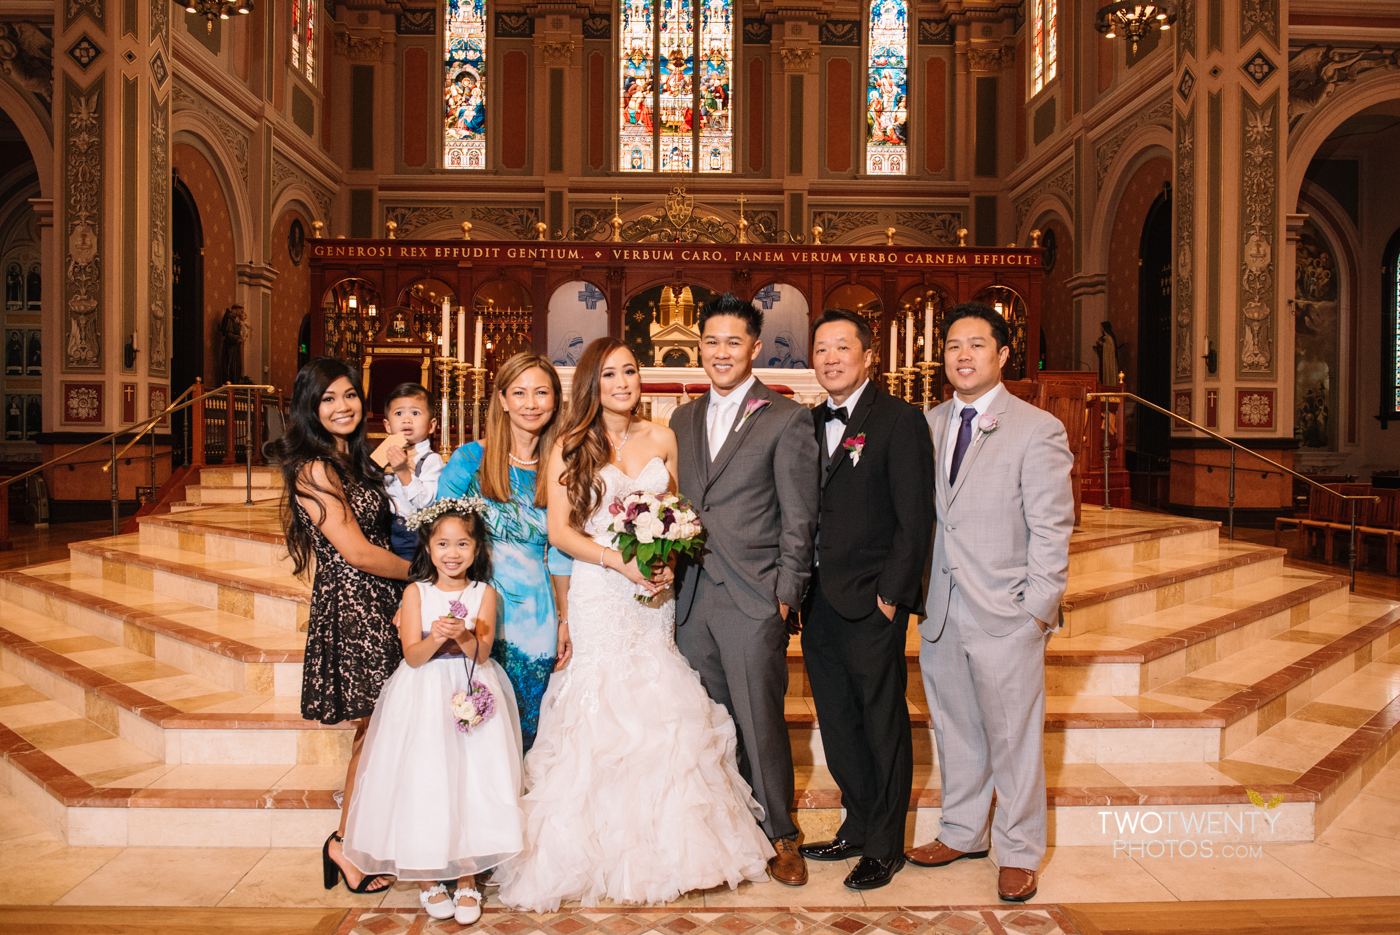 cathedral-of-the-sacred-sacrament-downtown-sacramento-wedding-photographer-36